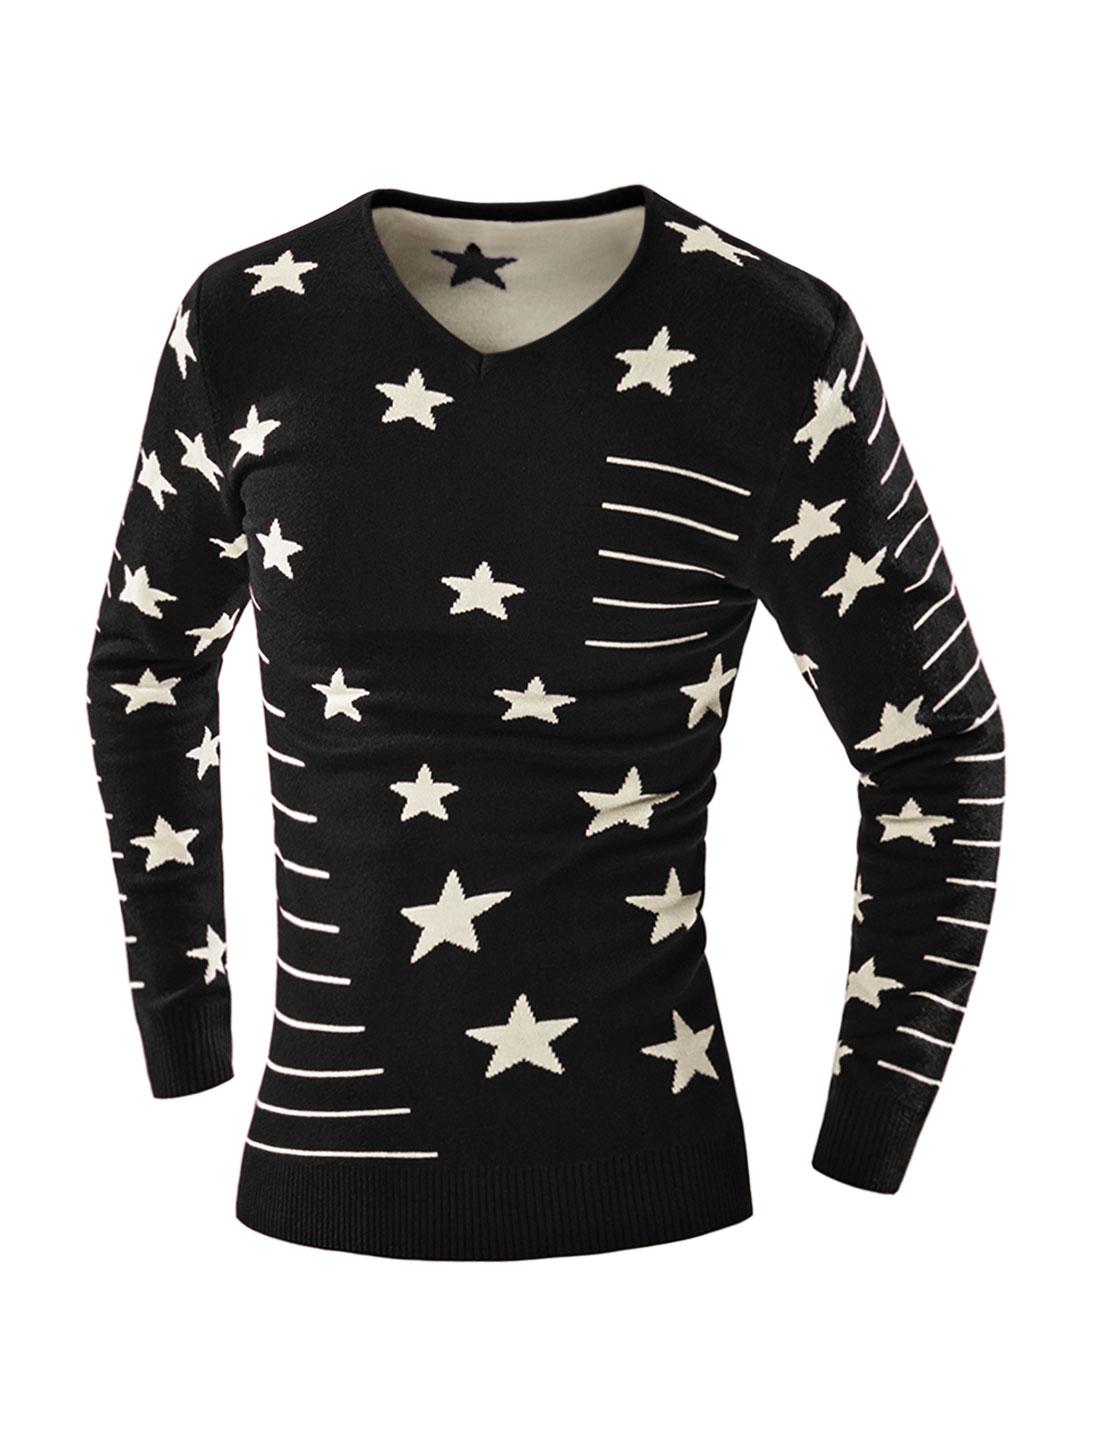 Man V Neck Slim Fit Striped Stars Knit Shirt Black M